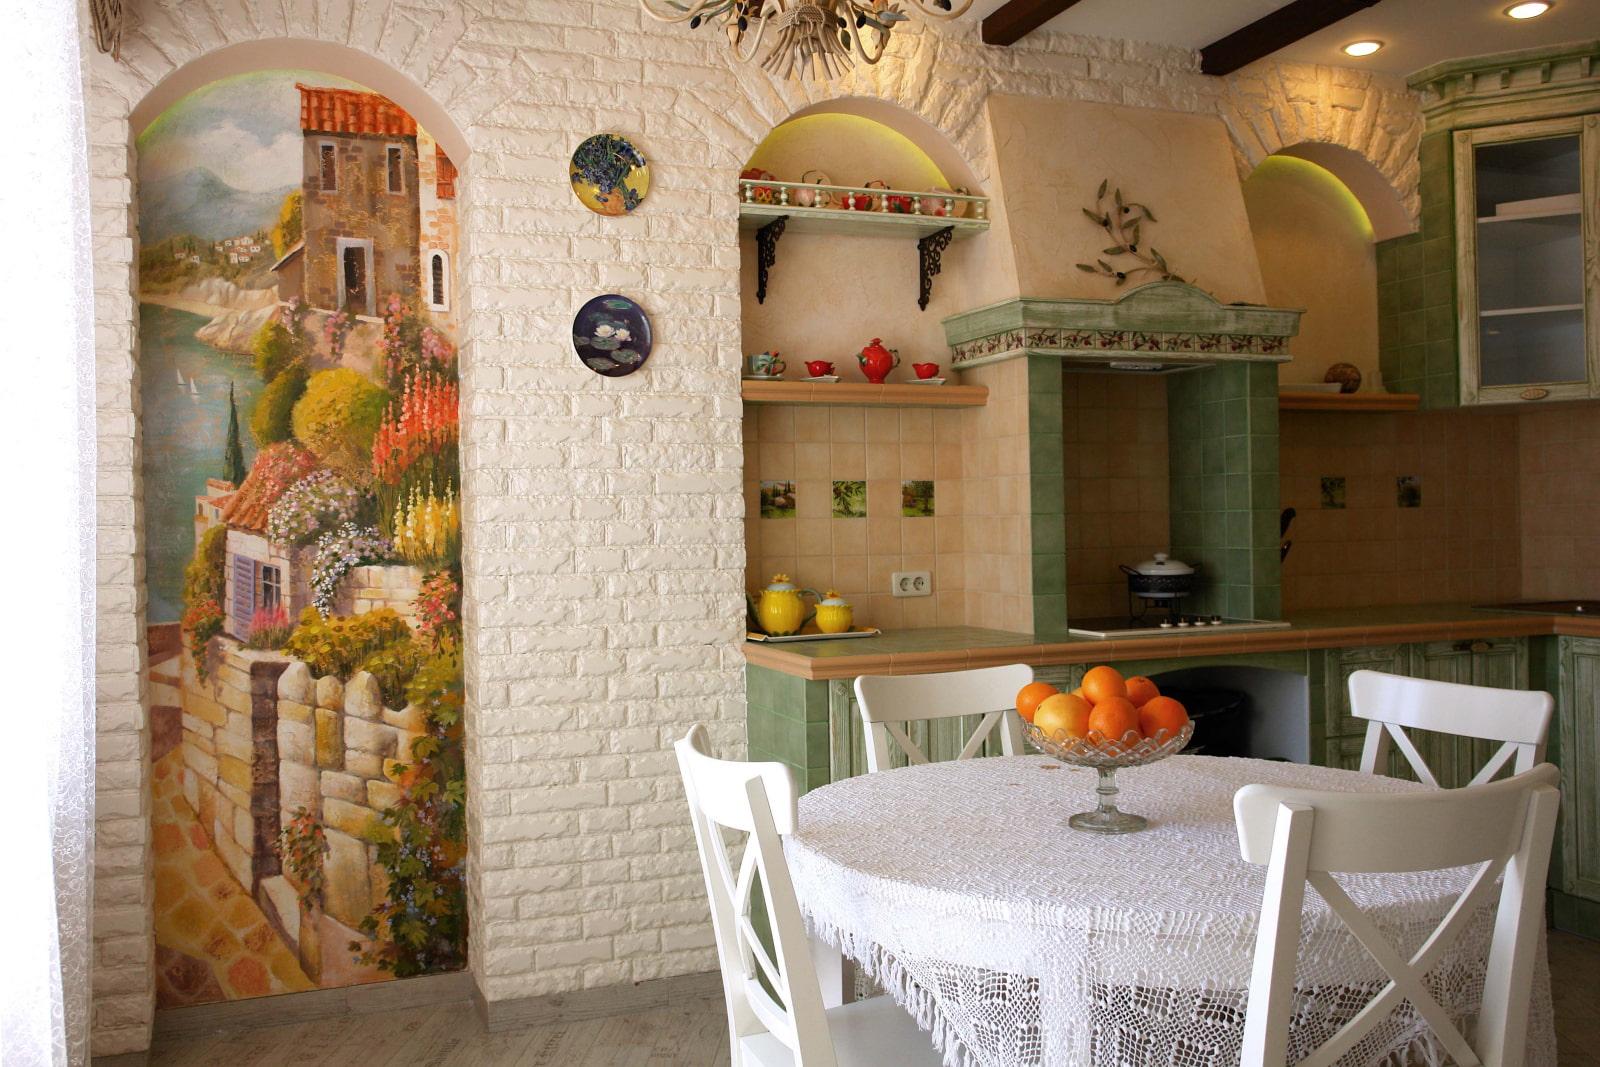 заявили, фрески небольшие на кухне фото позже все